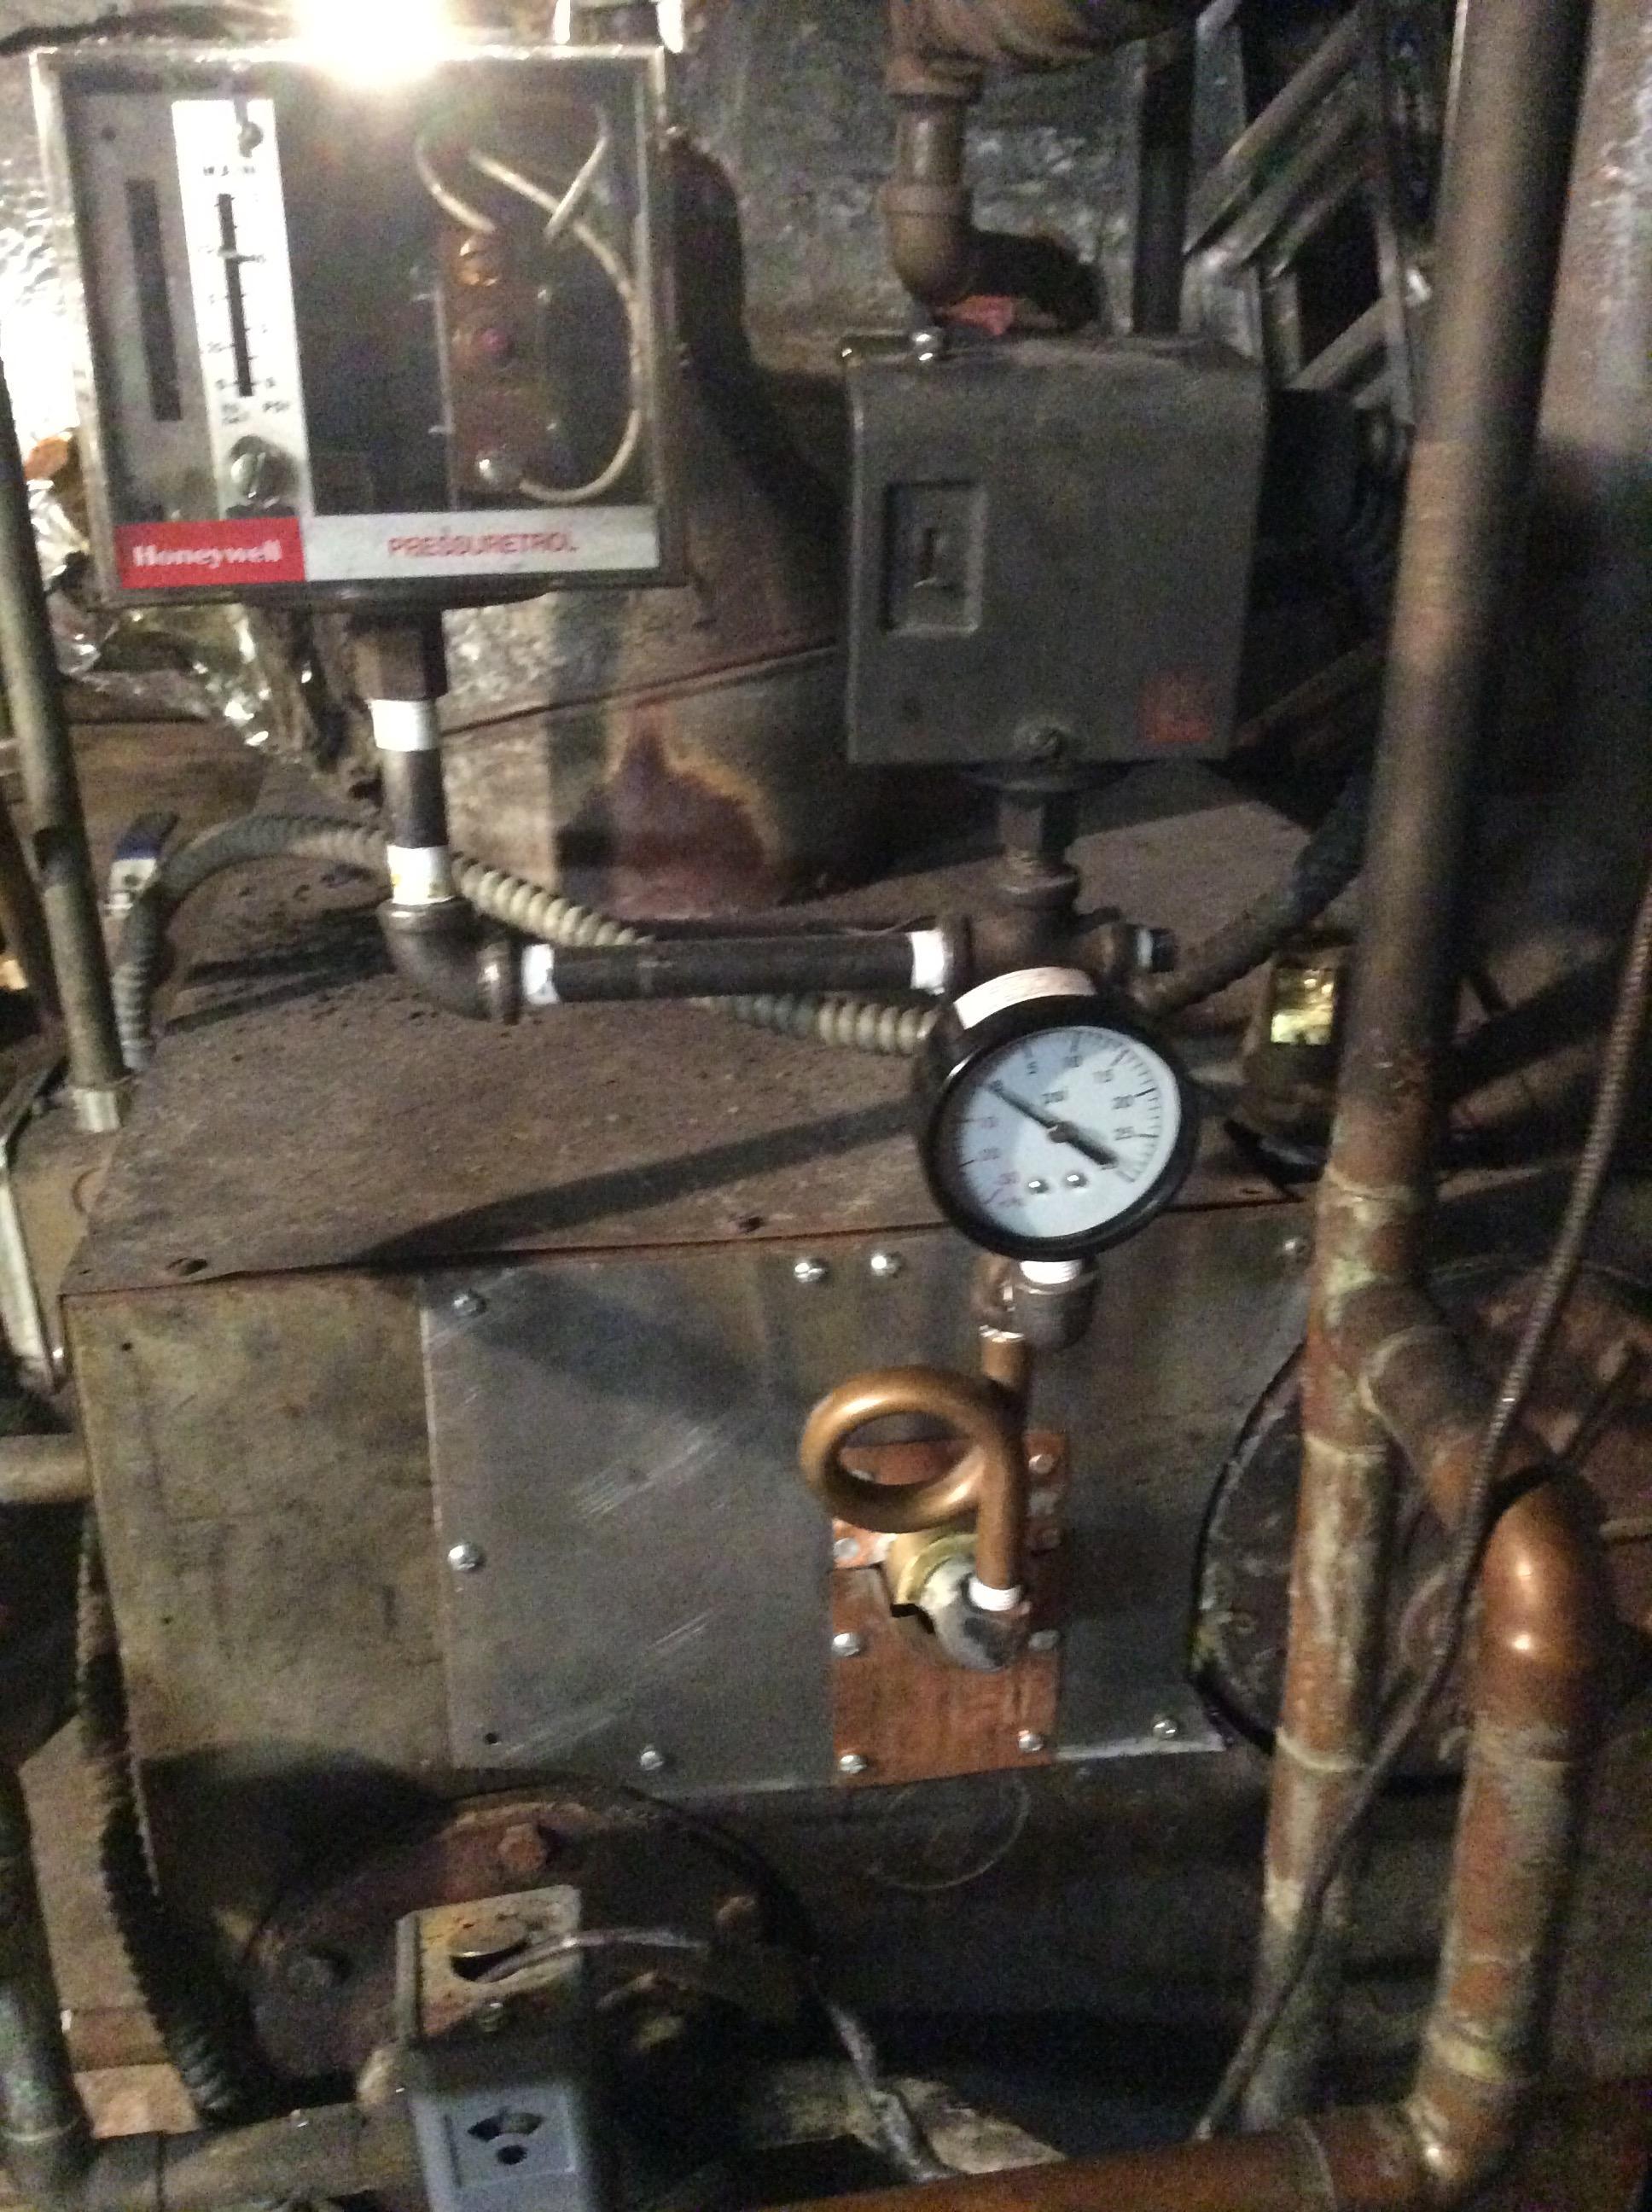 American Standard Ex 40cm Boiler Heating Help The Wall